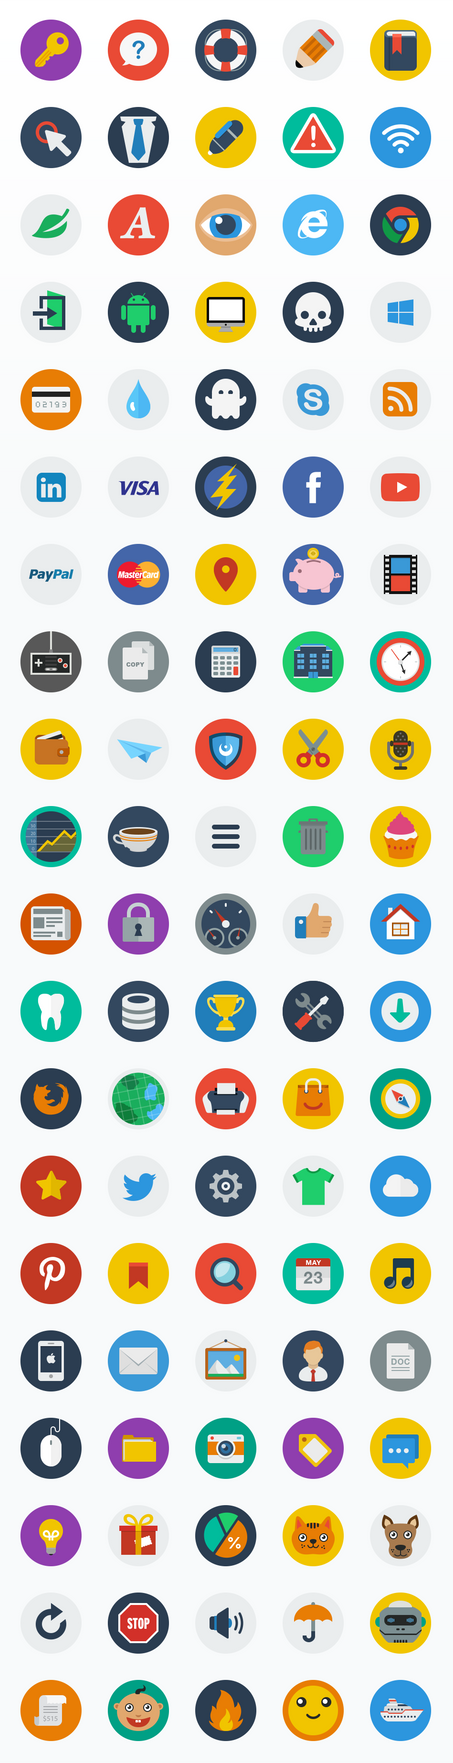 CreAtive - Flat Icons by sandracz